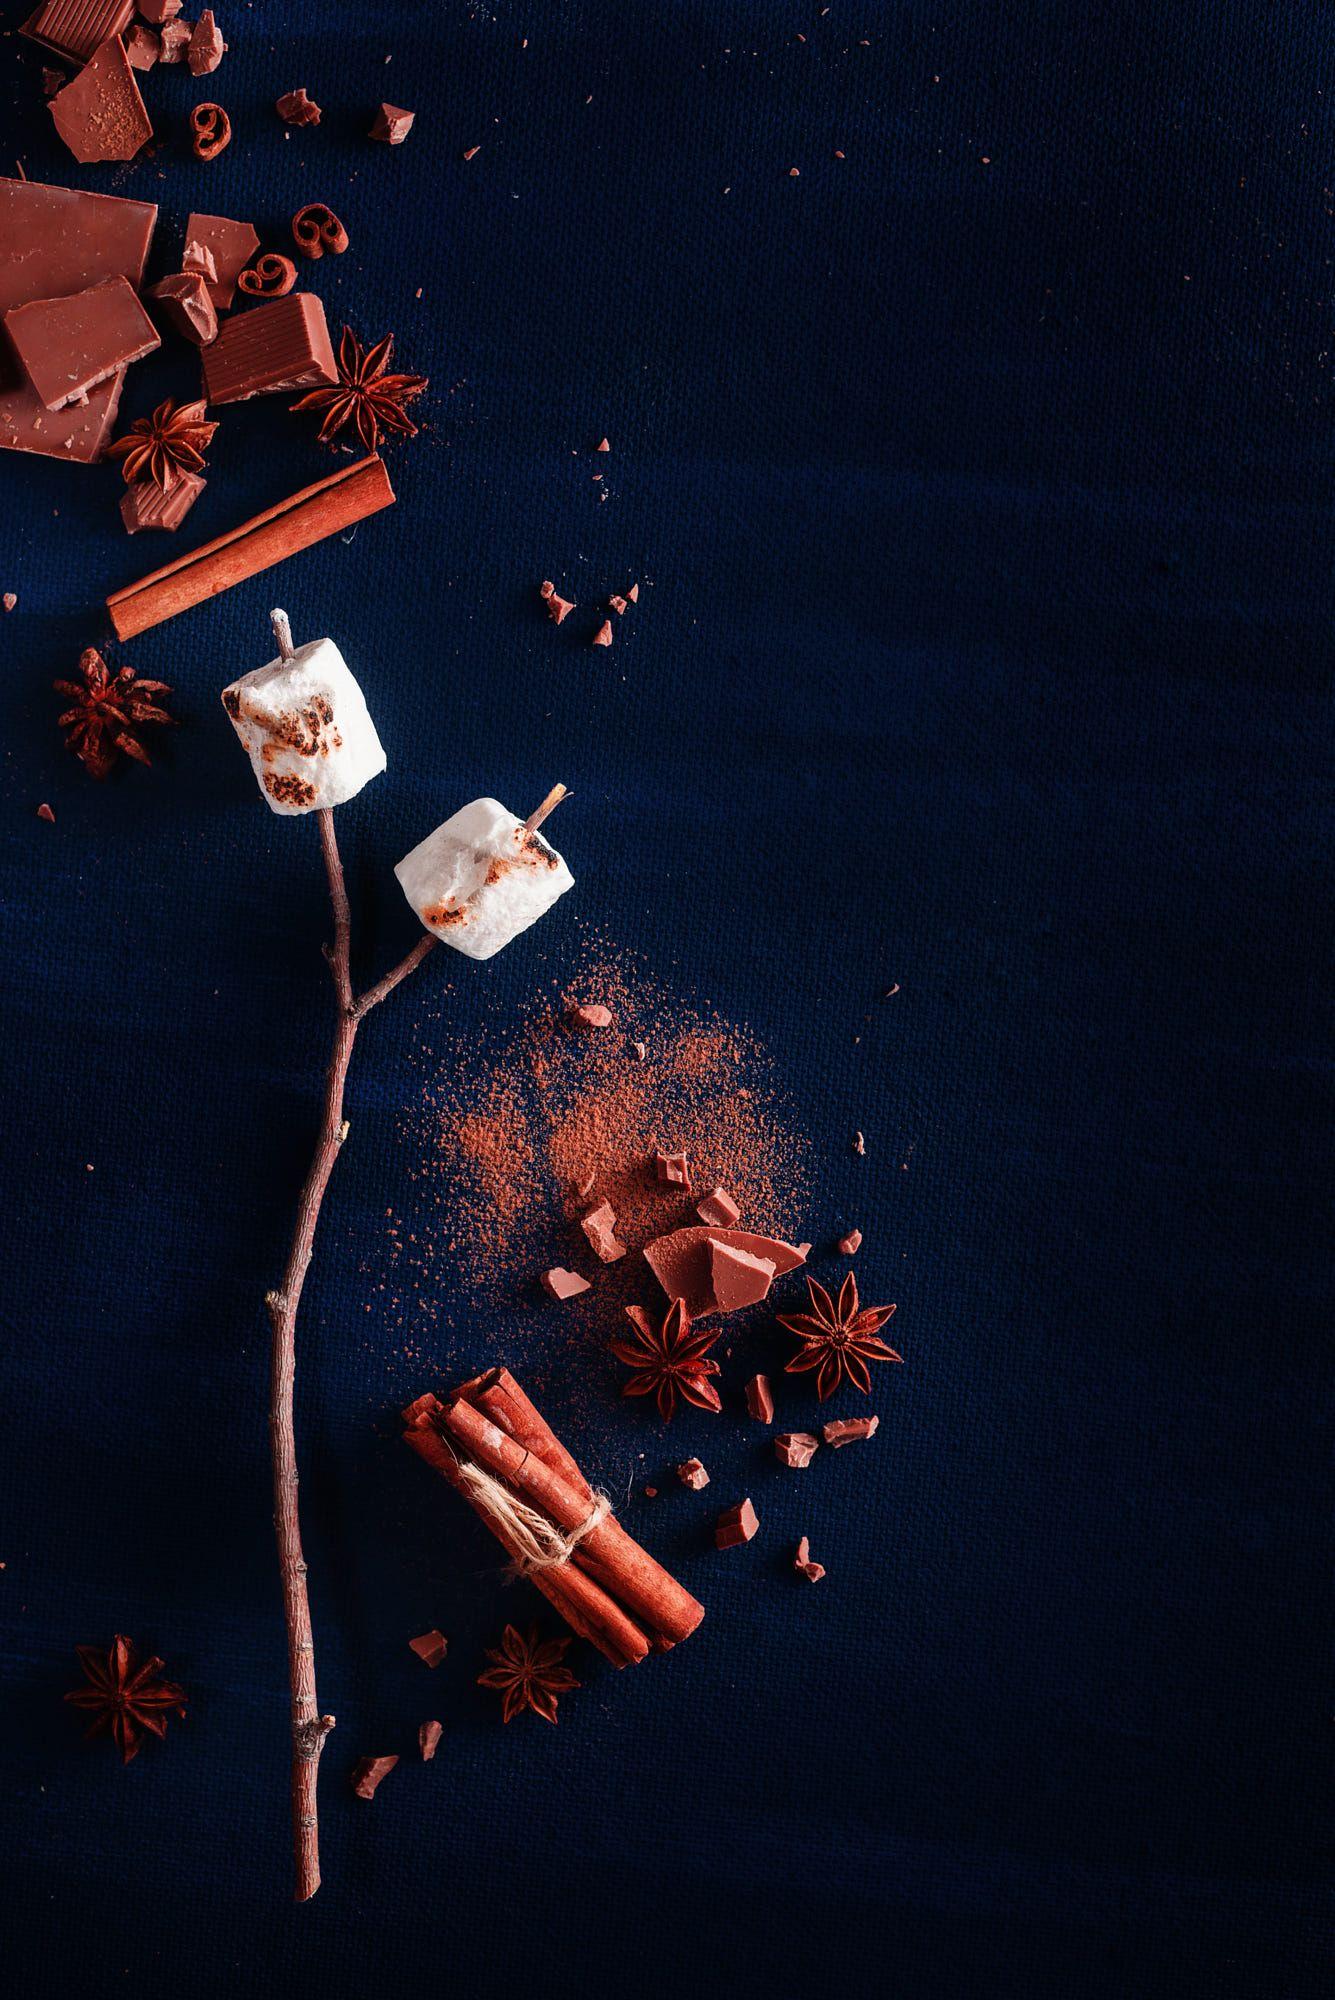 Dark food still life with roasted marshmallows, cocoa powder ...